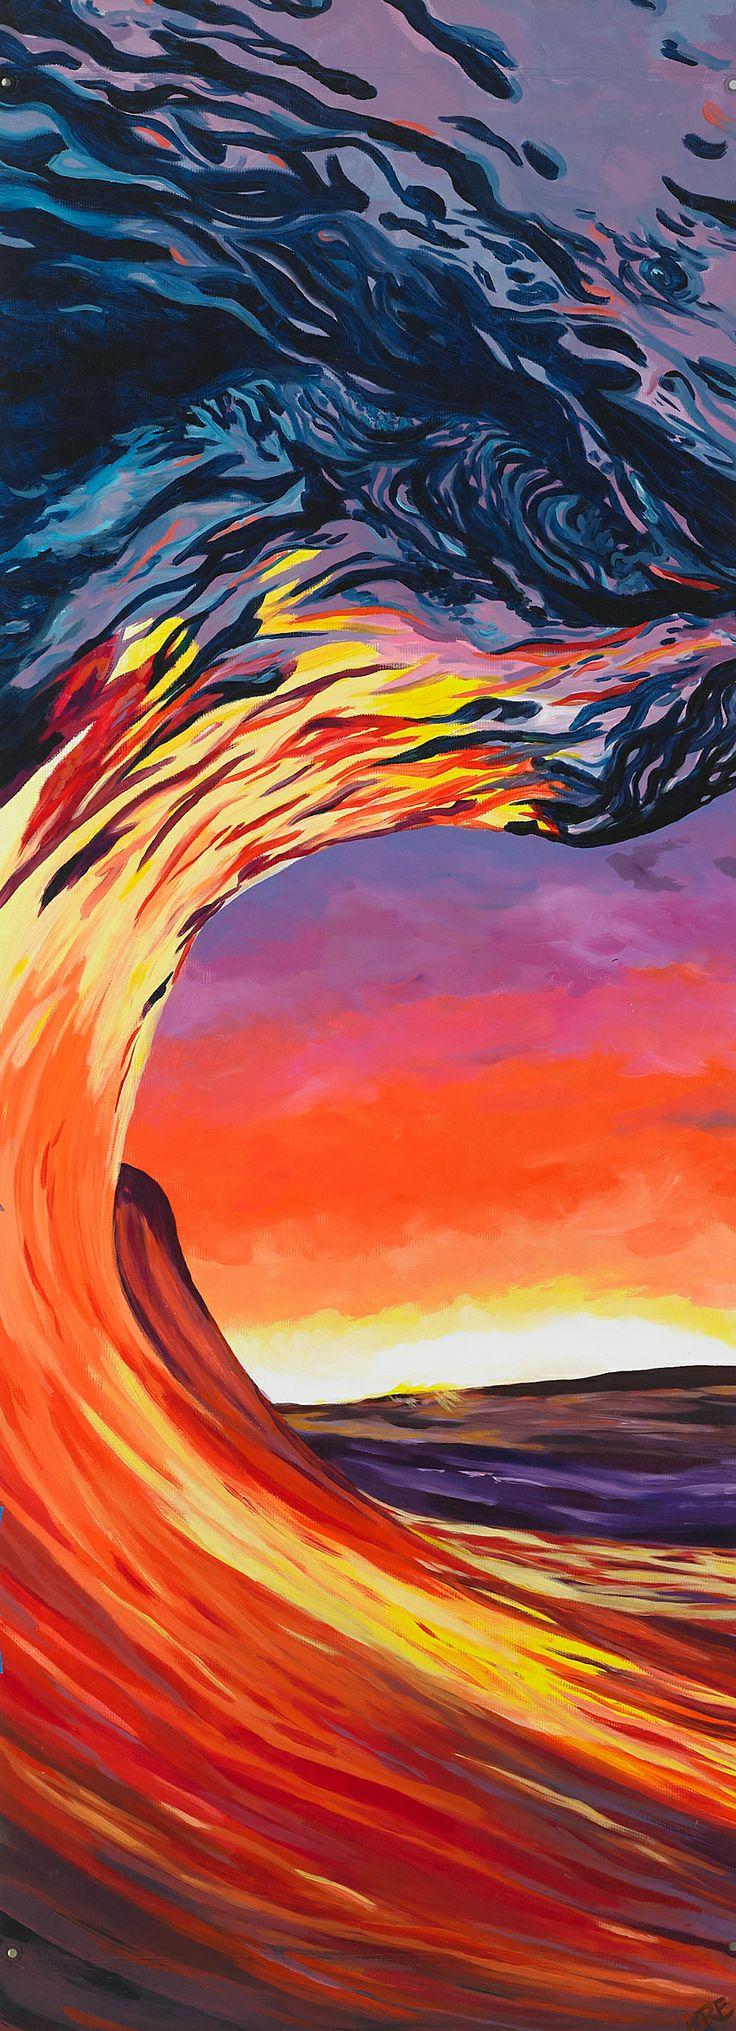 Sunset Wave Painting Inspo